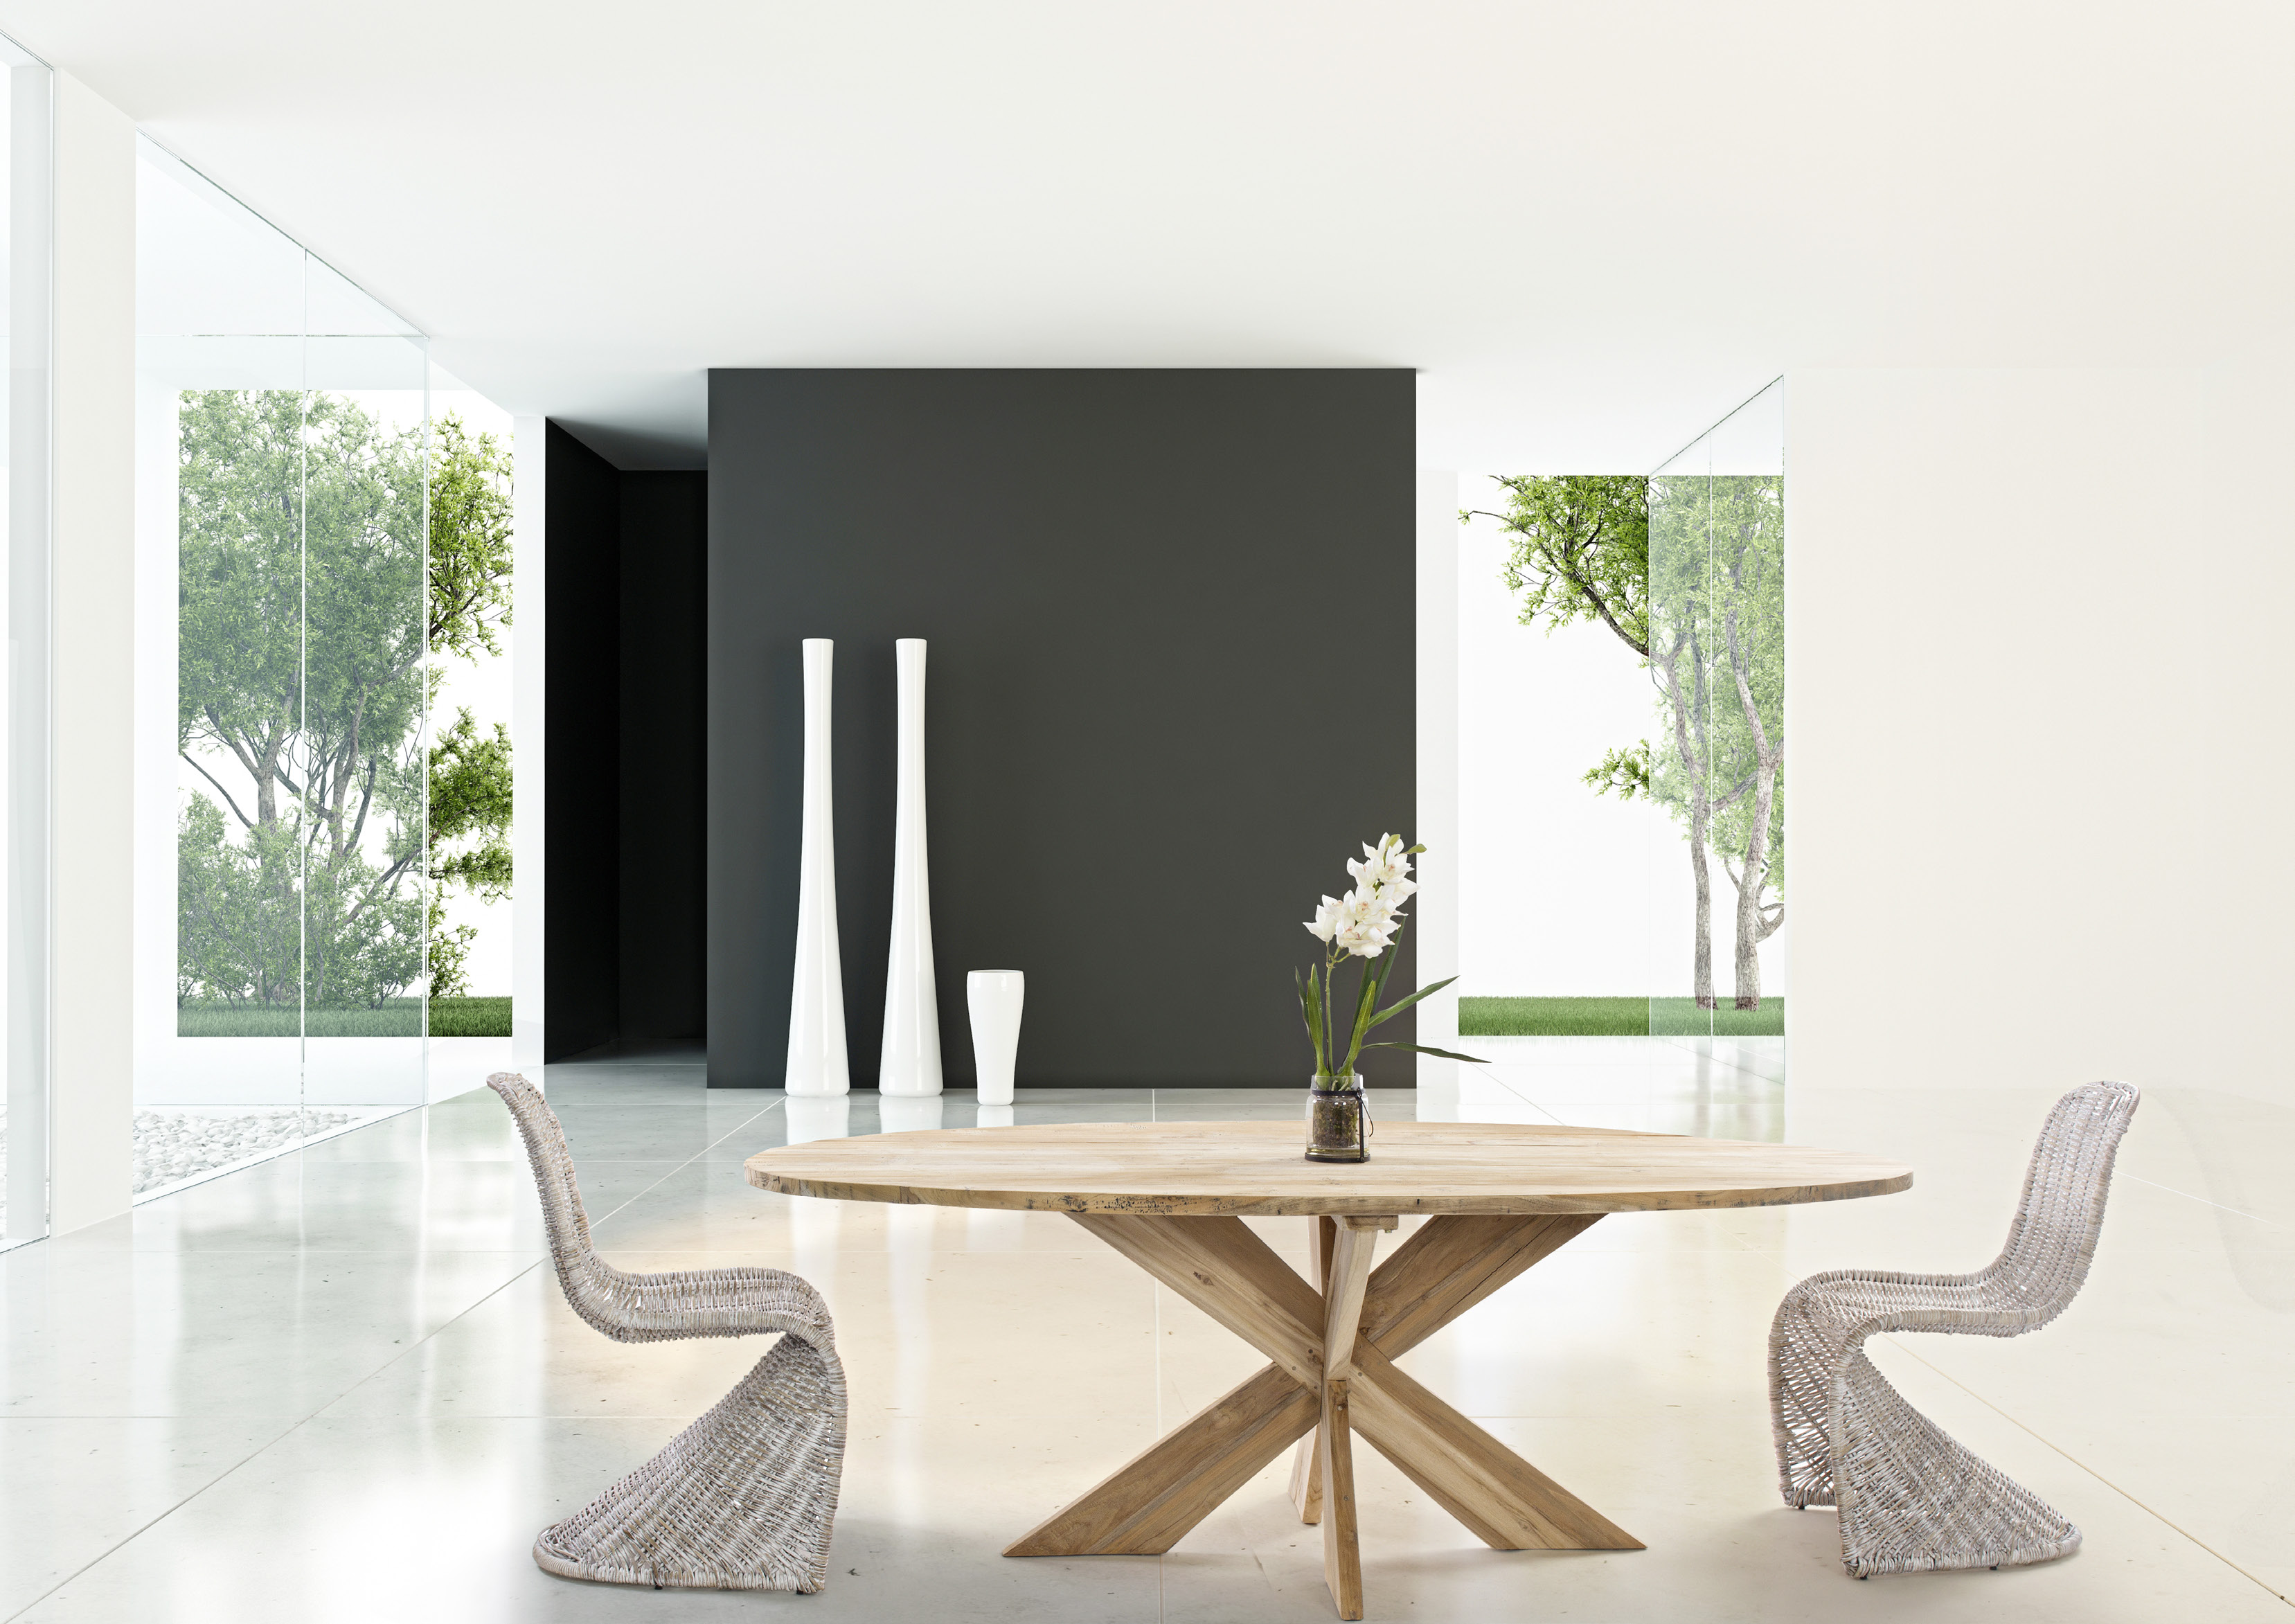 Sale da pranzo - Bambù 2000 di Fontana Americo | Artigianato ed ...